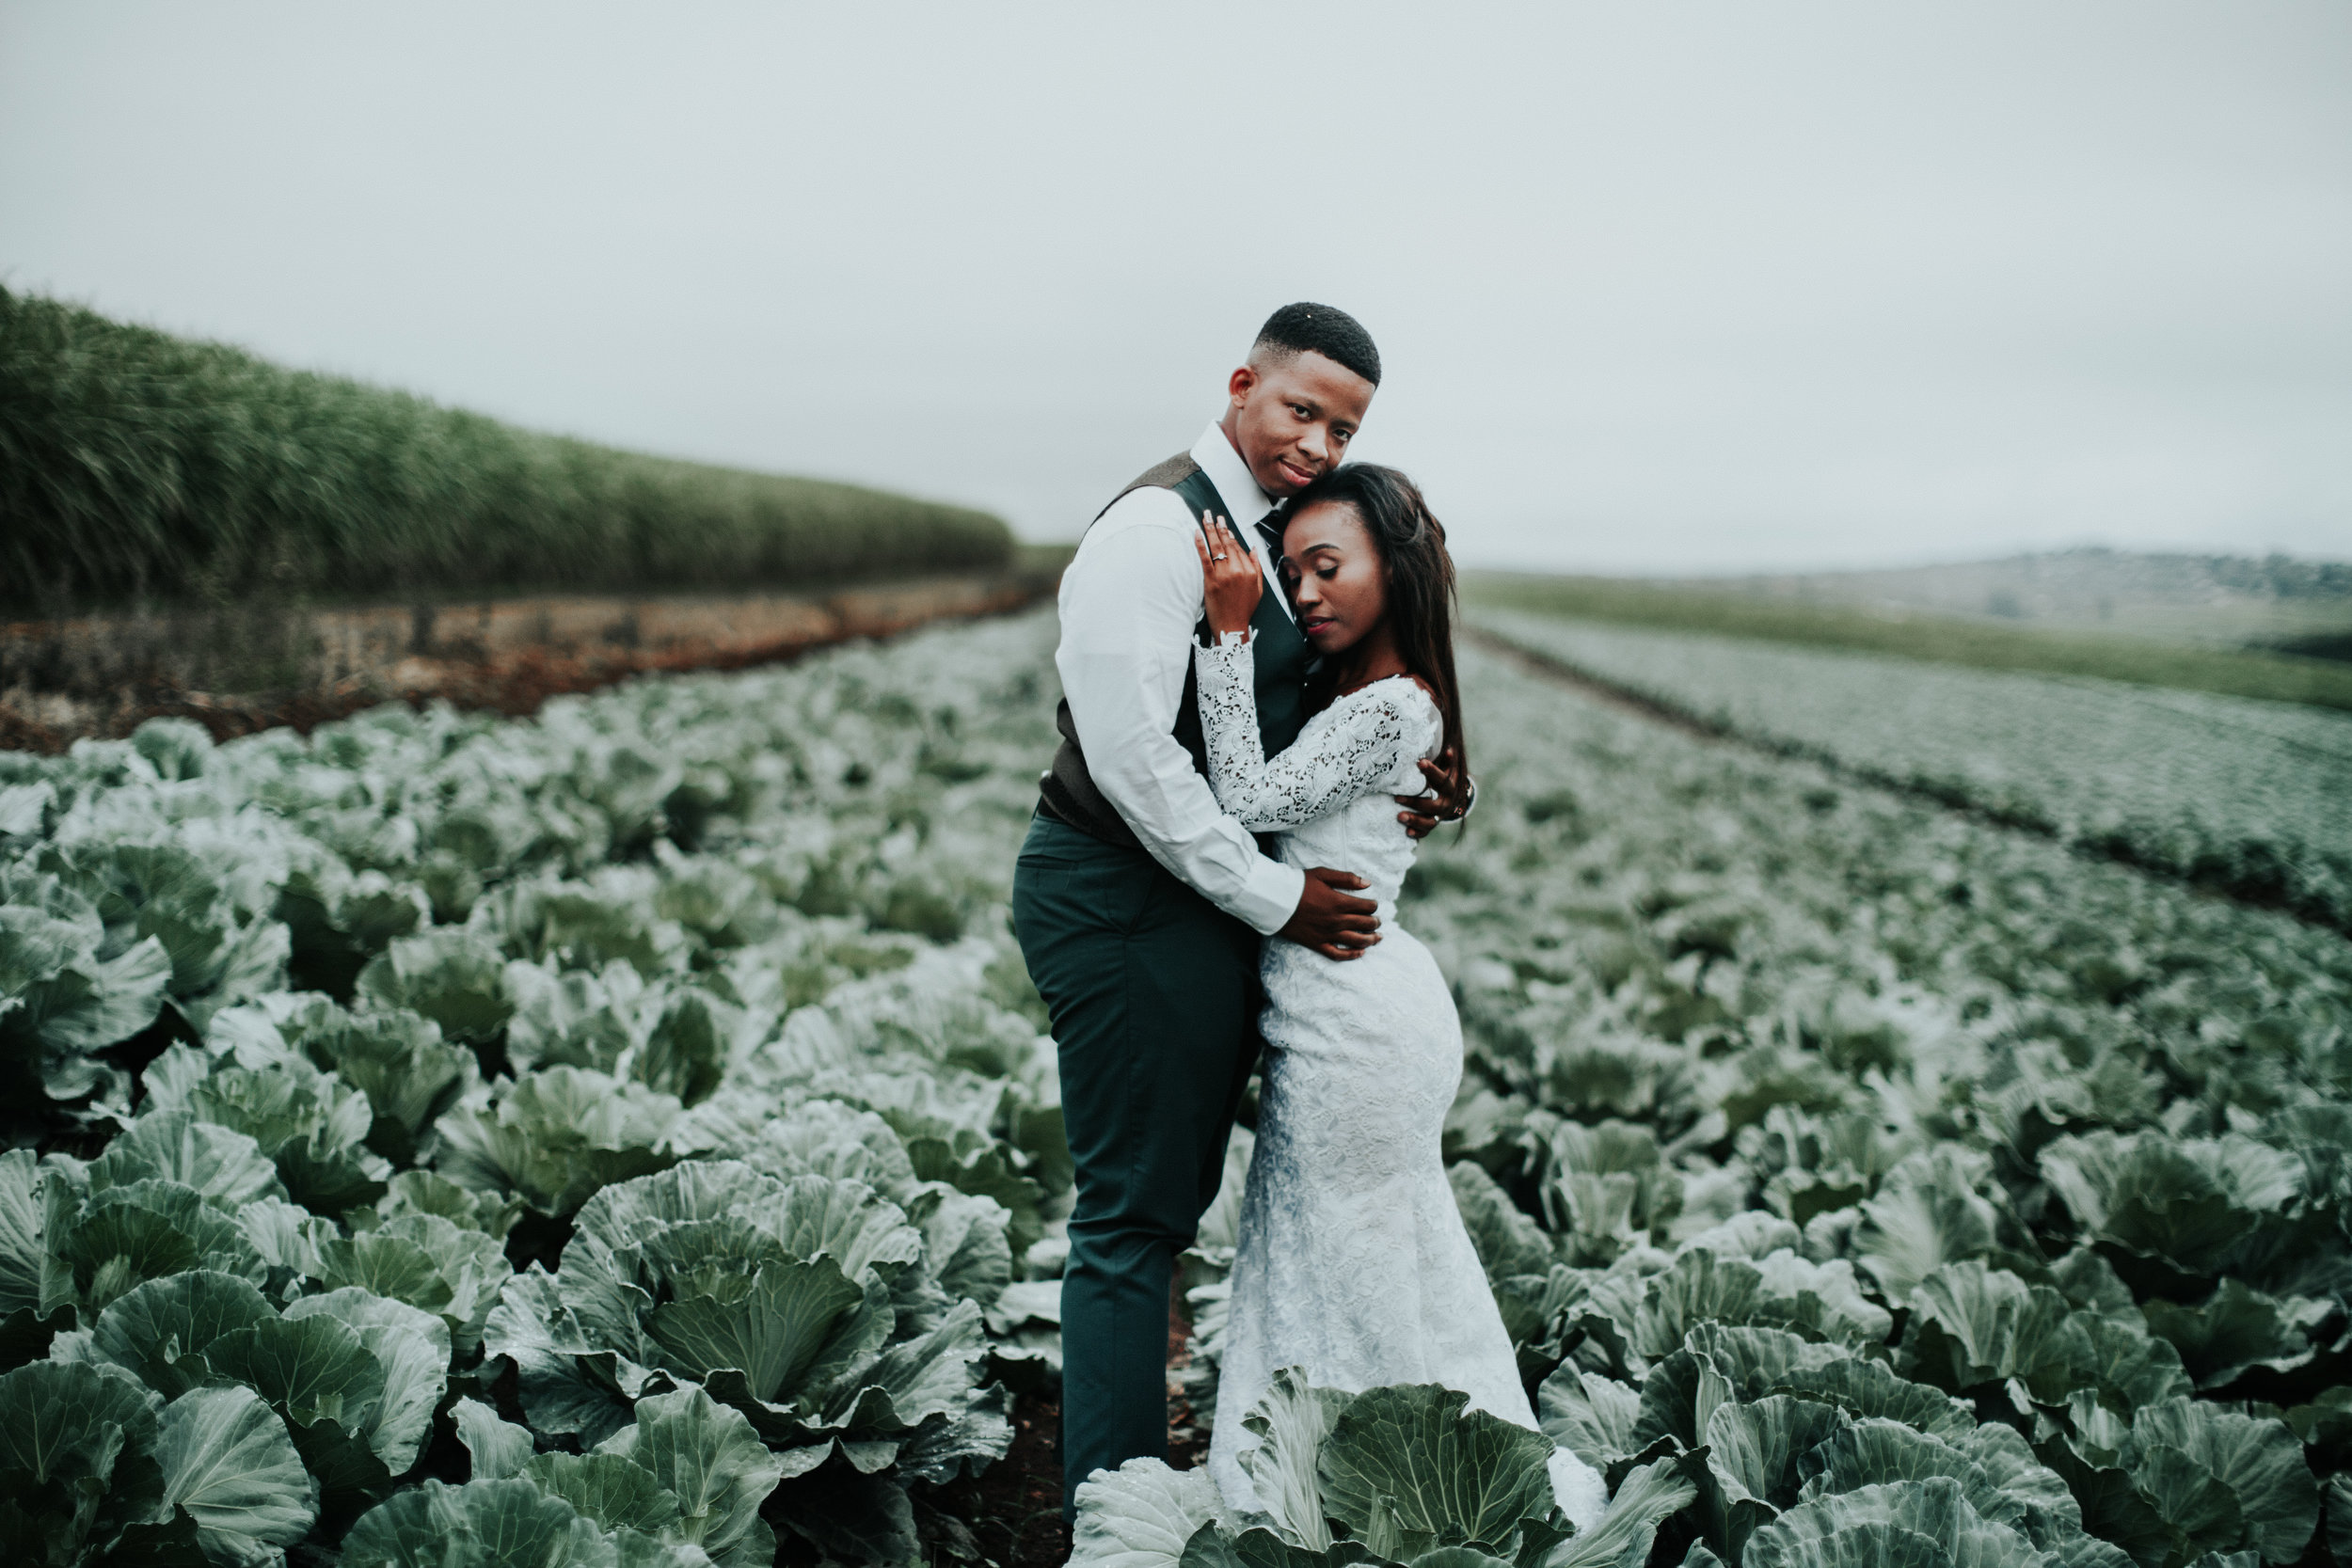 Kristi Smith Photography - Wedding Photography 5.jpg